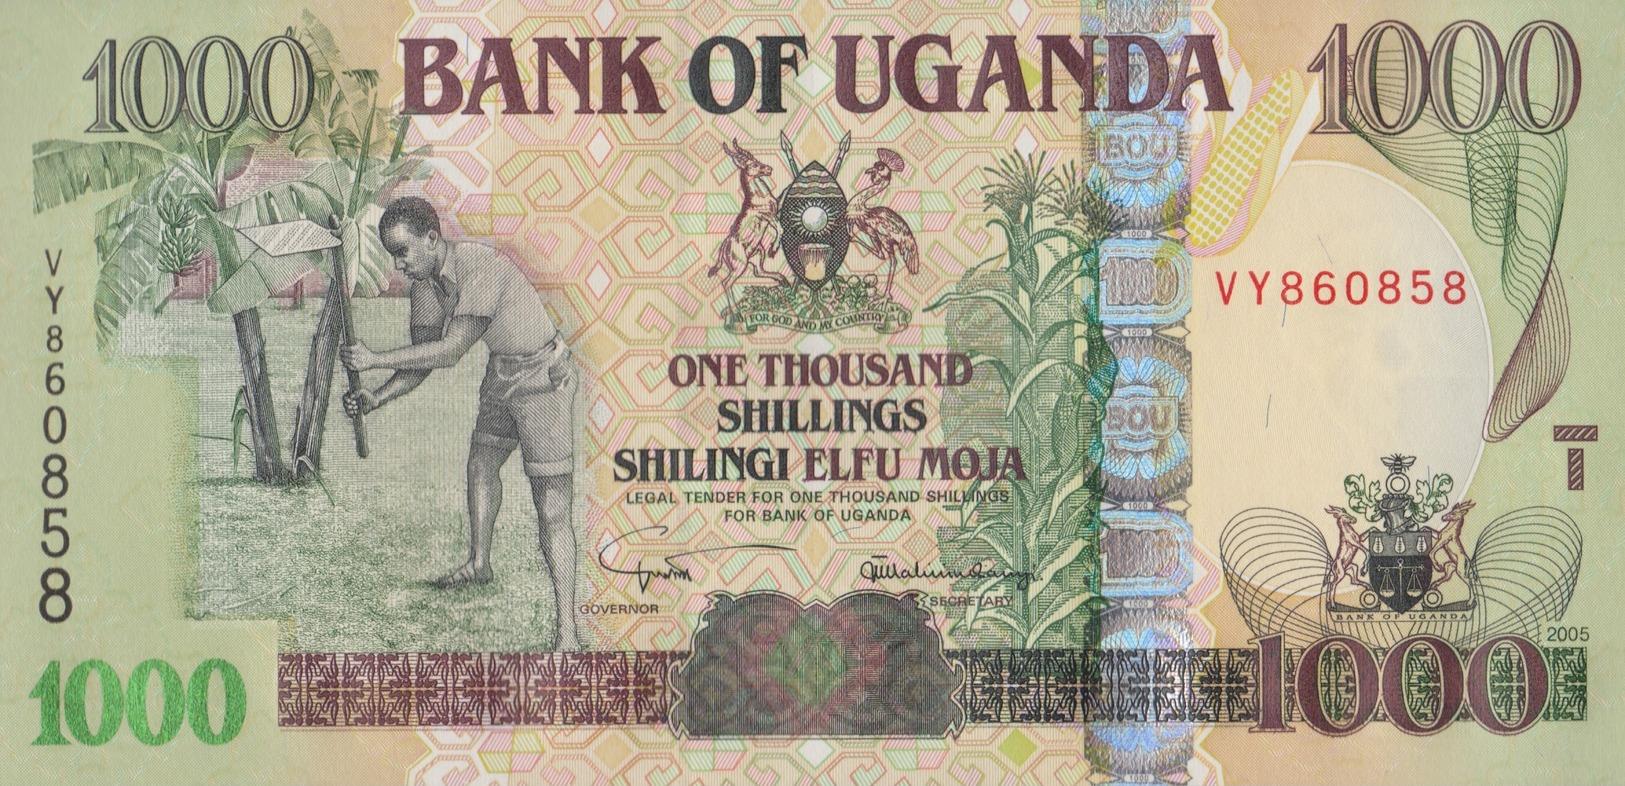 Ouganda / 100 Shillings / 2005 / P-43(a) / UNC - Ouganda